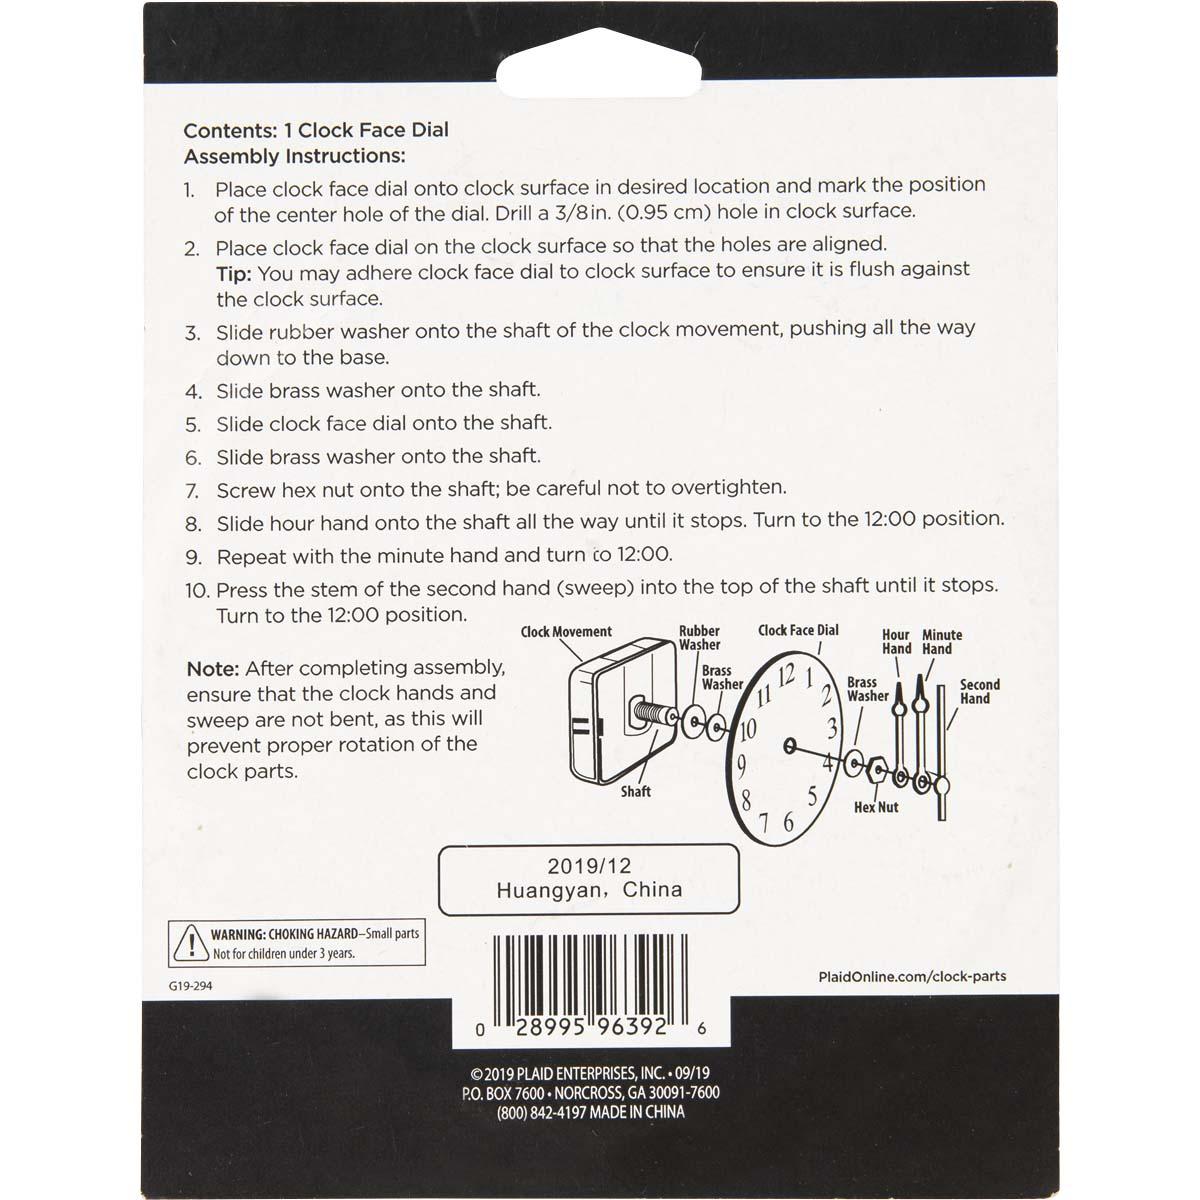 Plaid ® Accessories - Clock Face - Gold, 4-1/2